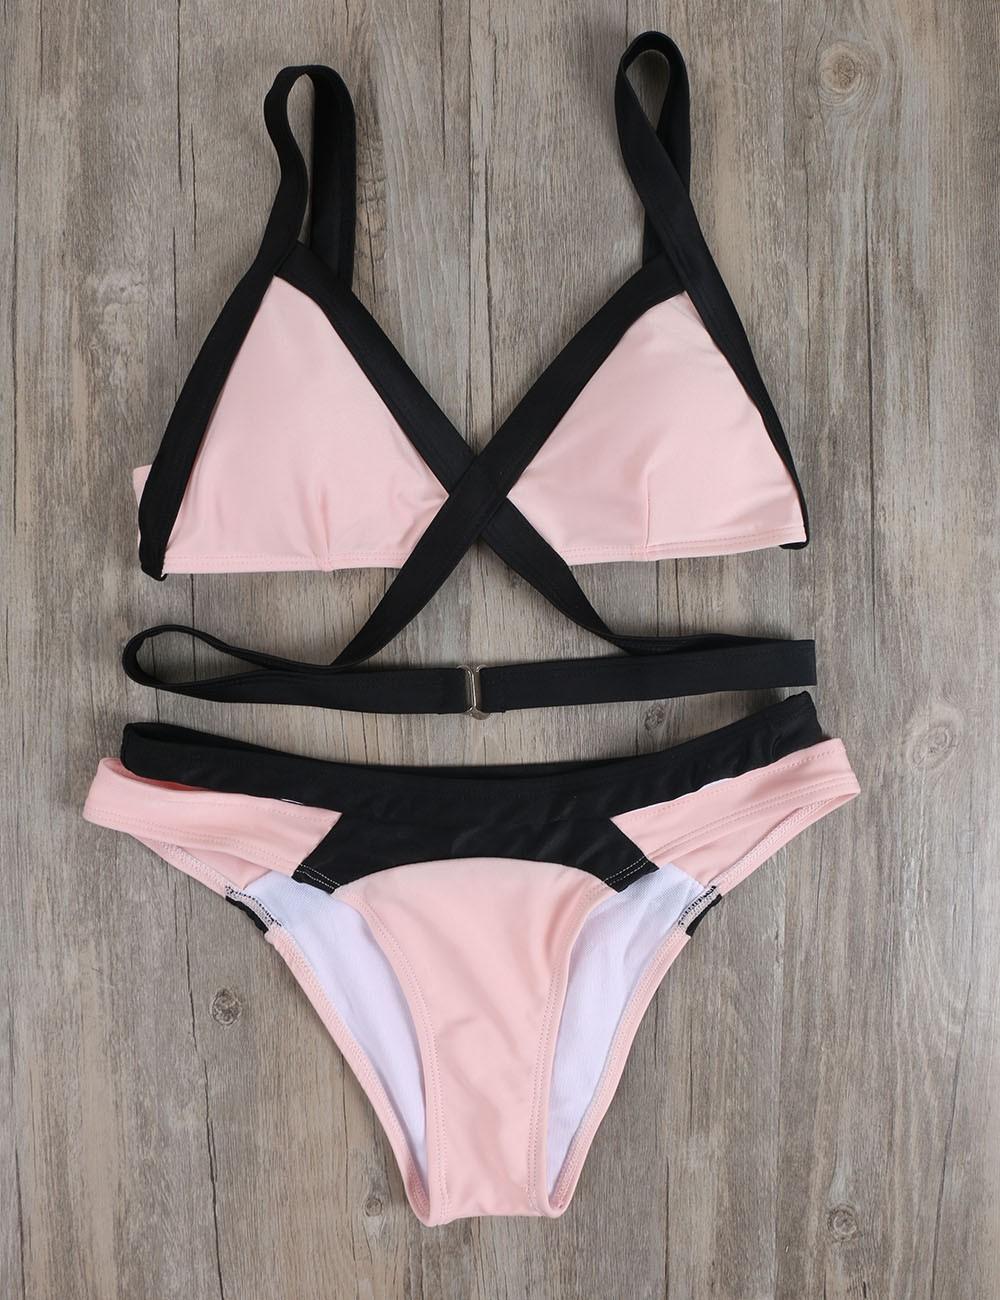 Summer Pink Plus Size Bikini Set Swimwear Women Push Up Bikinis 18 Bathing Suit Sexy Cut Out Beach Wear Cross Swimsuit Biquin 4